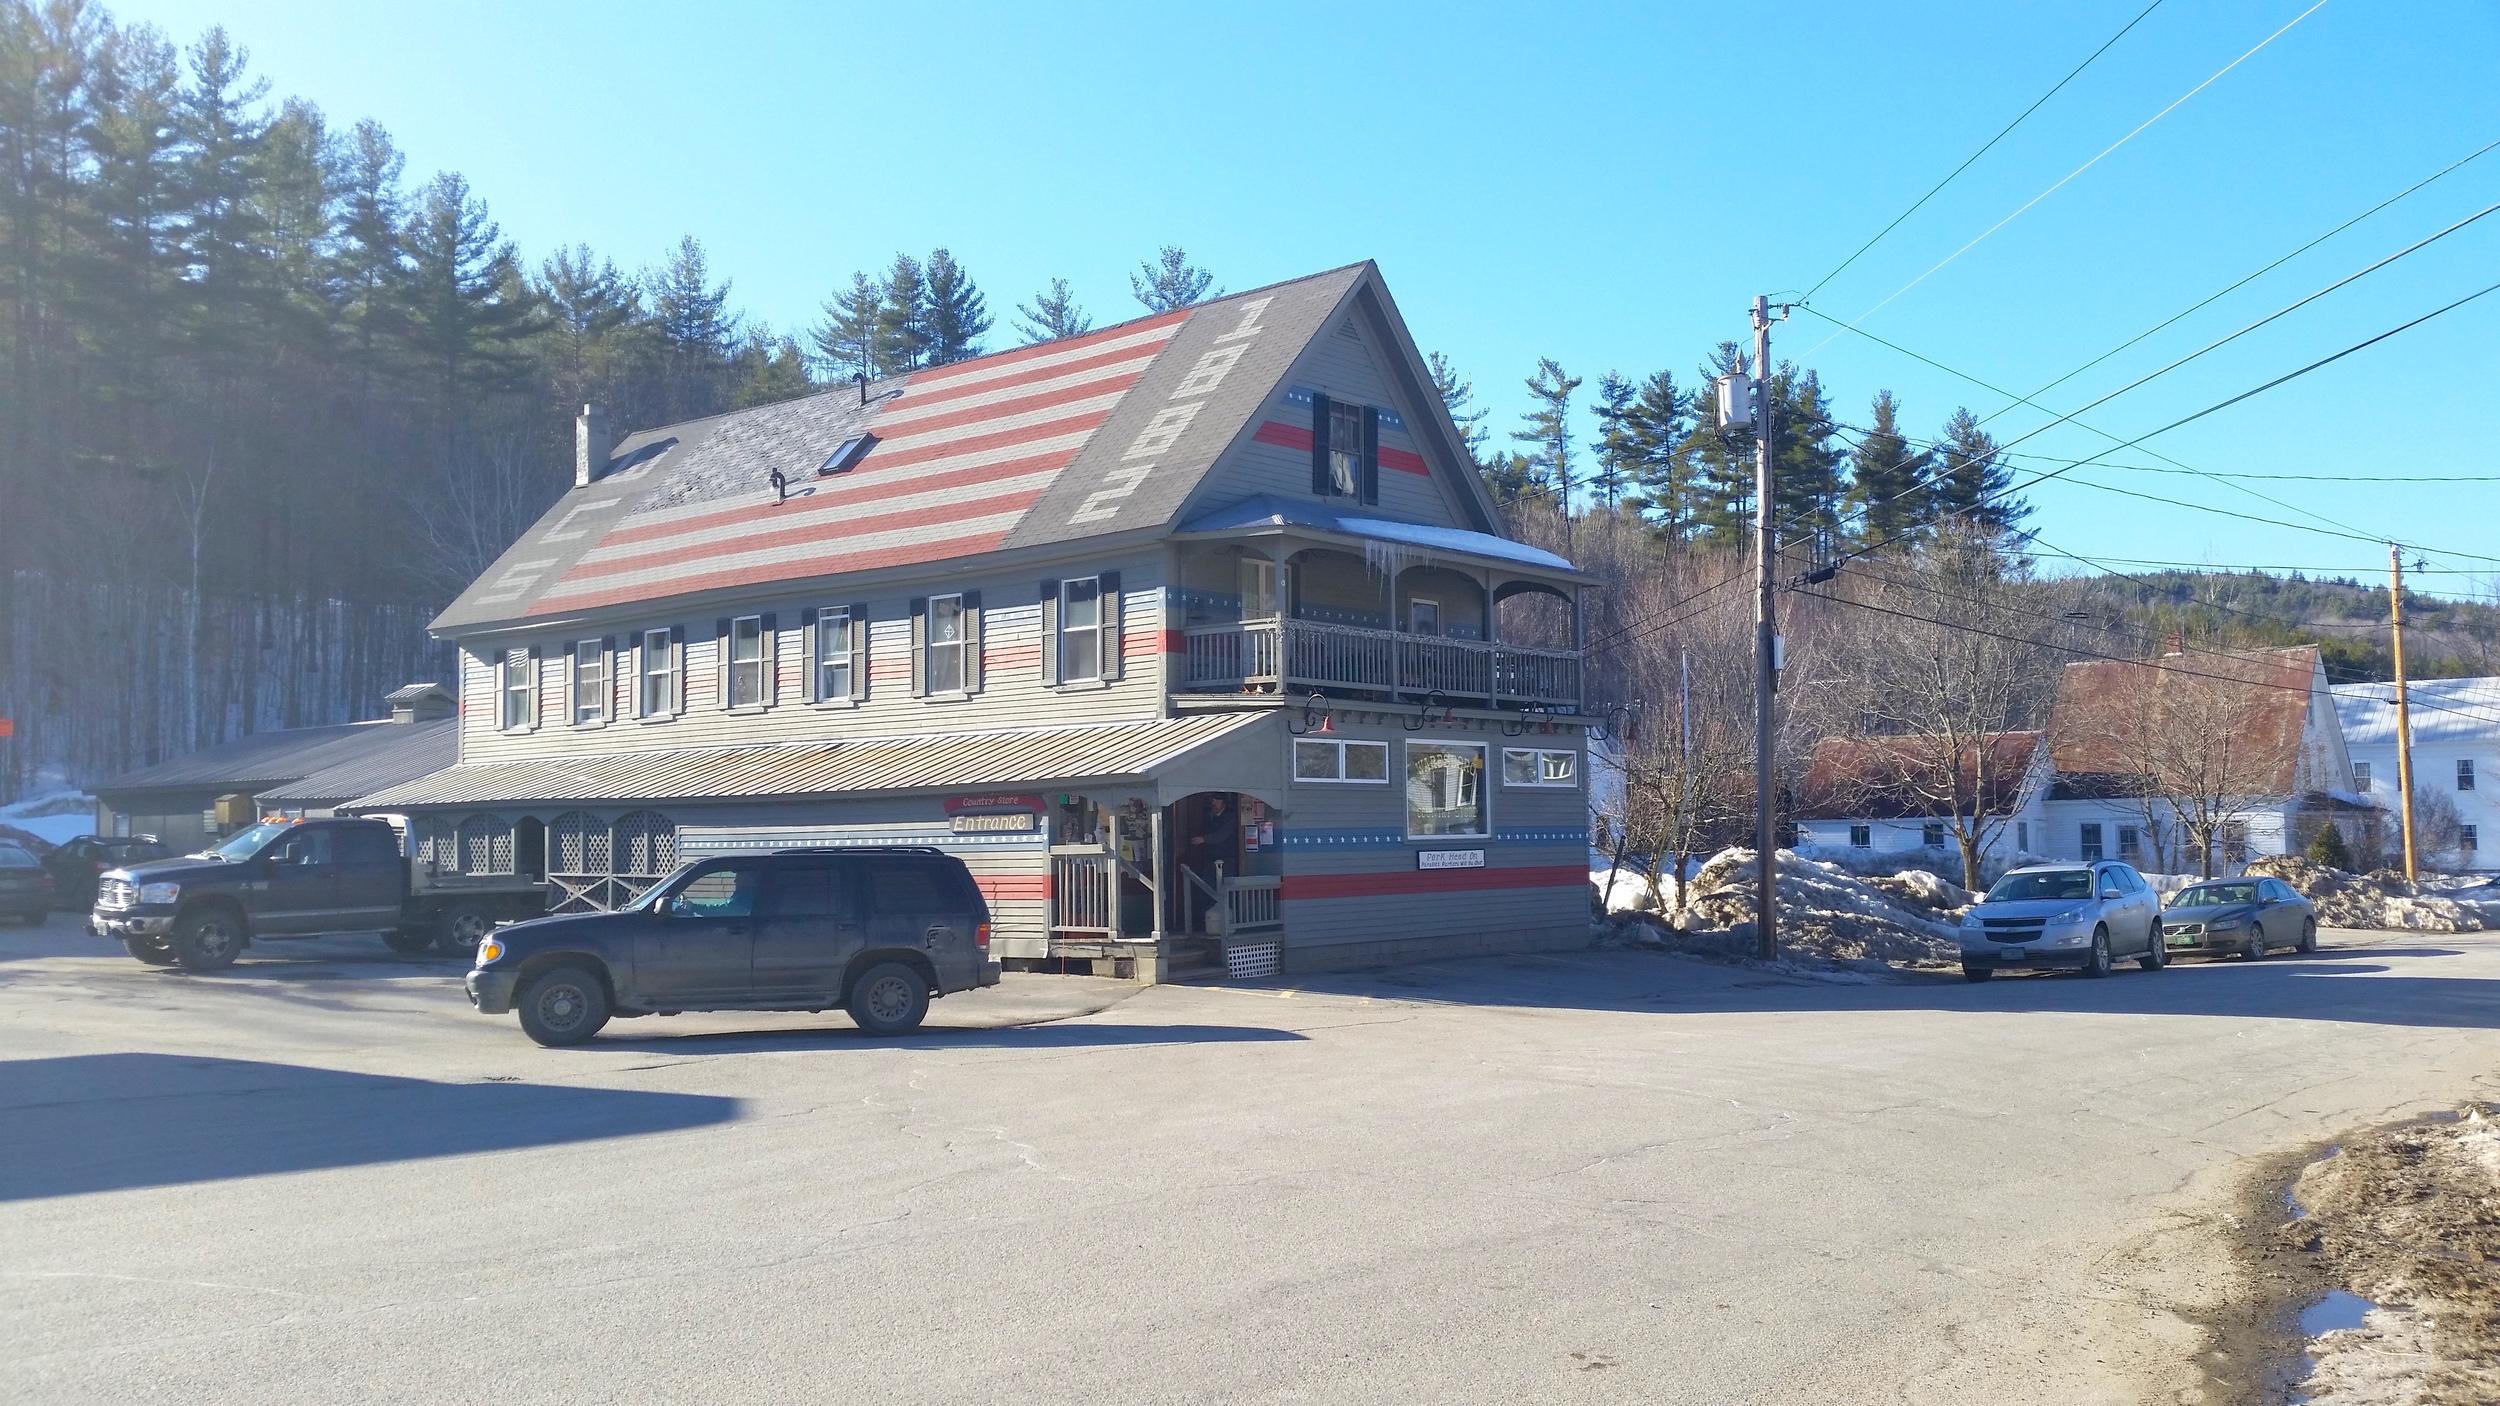 The Wardsboro Country Store